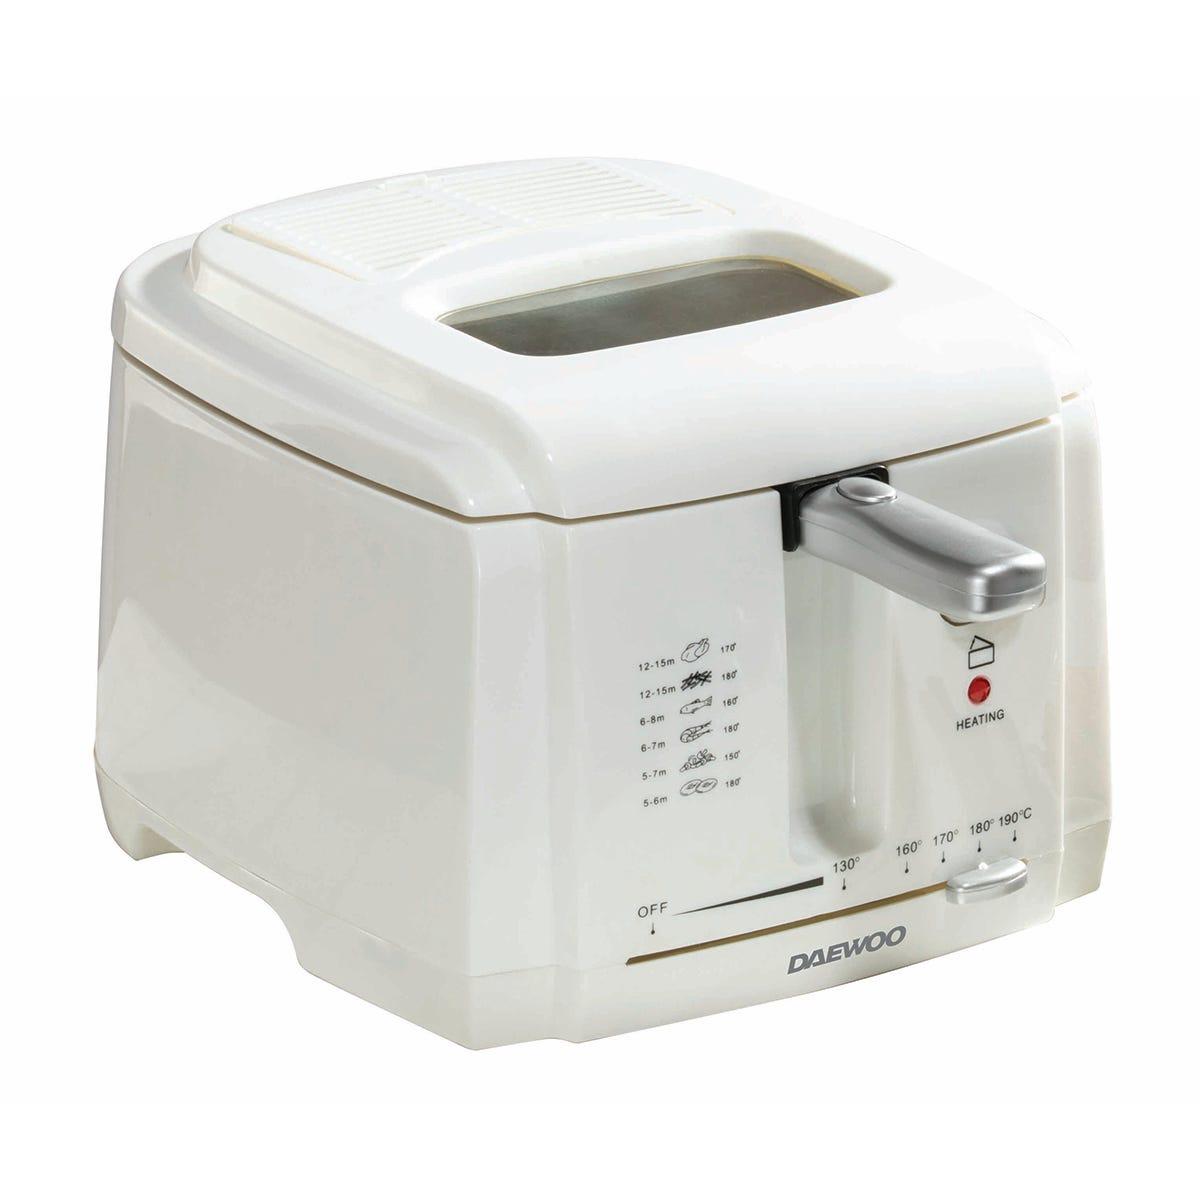 Daewoo SDA1378DS 2L 1500W Deep Fat Fryer - White